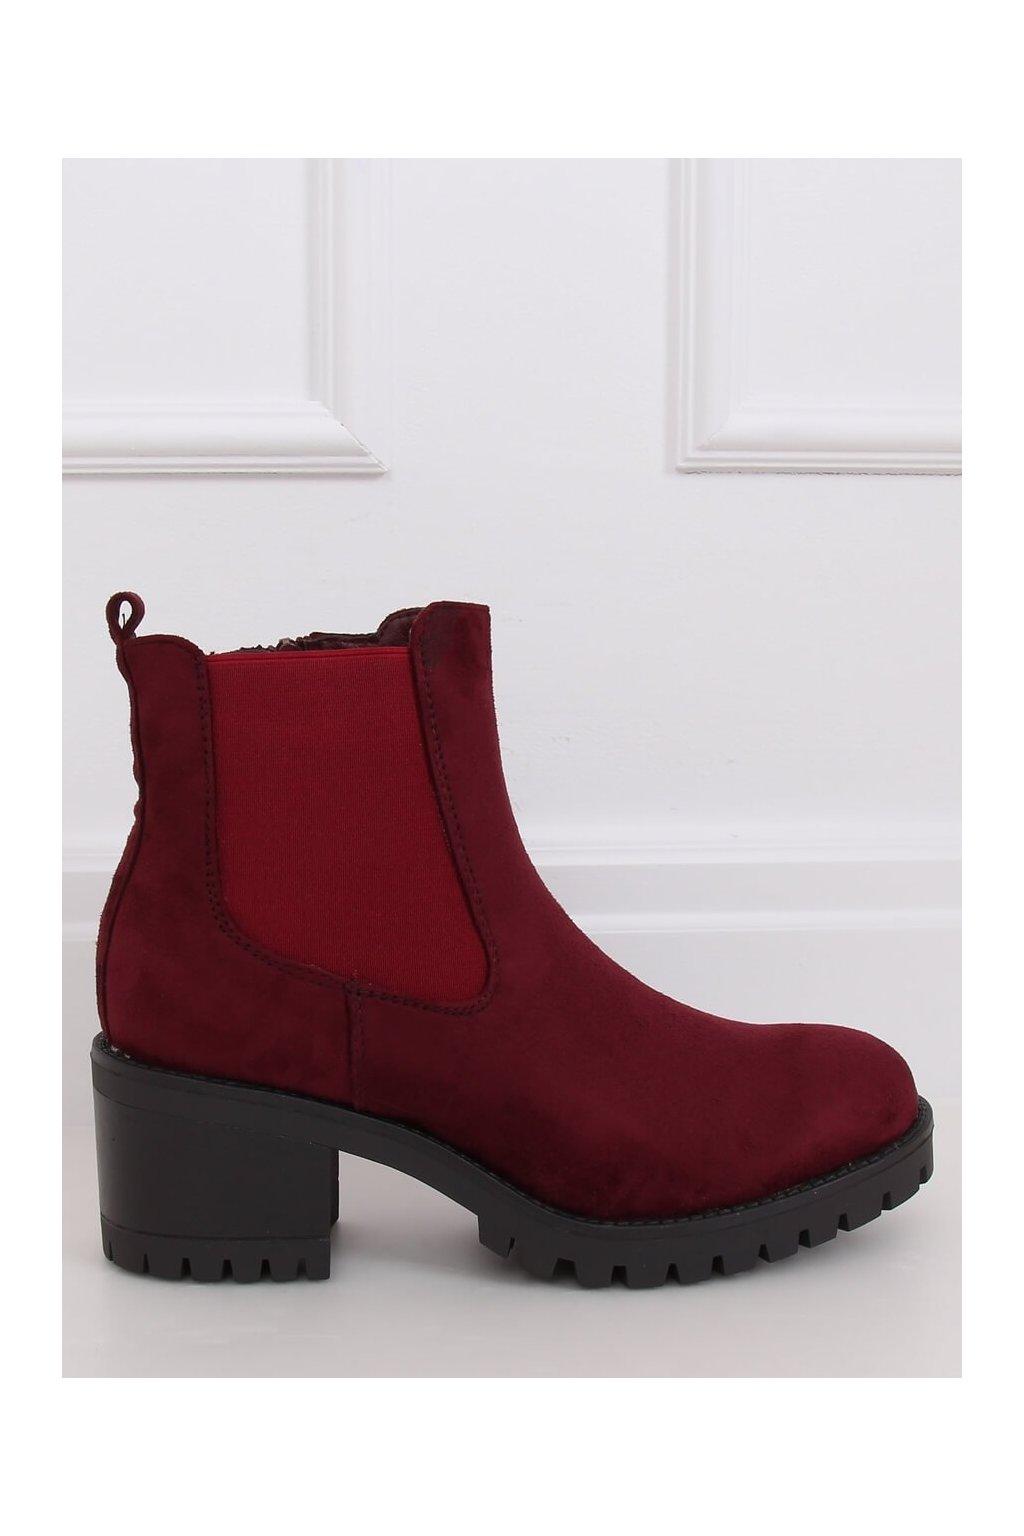 Dámske členkové topánky červené na širokom podpätku 4935